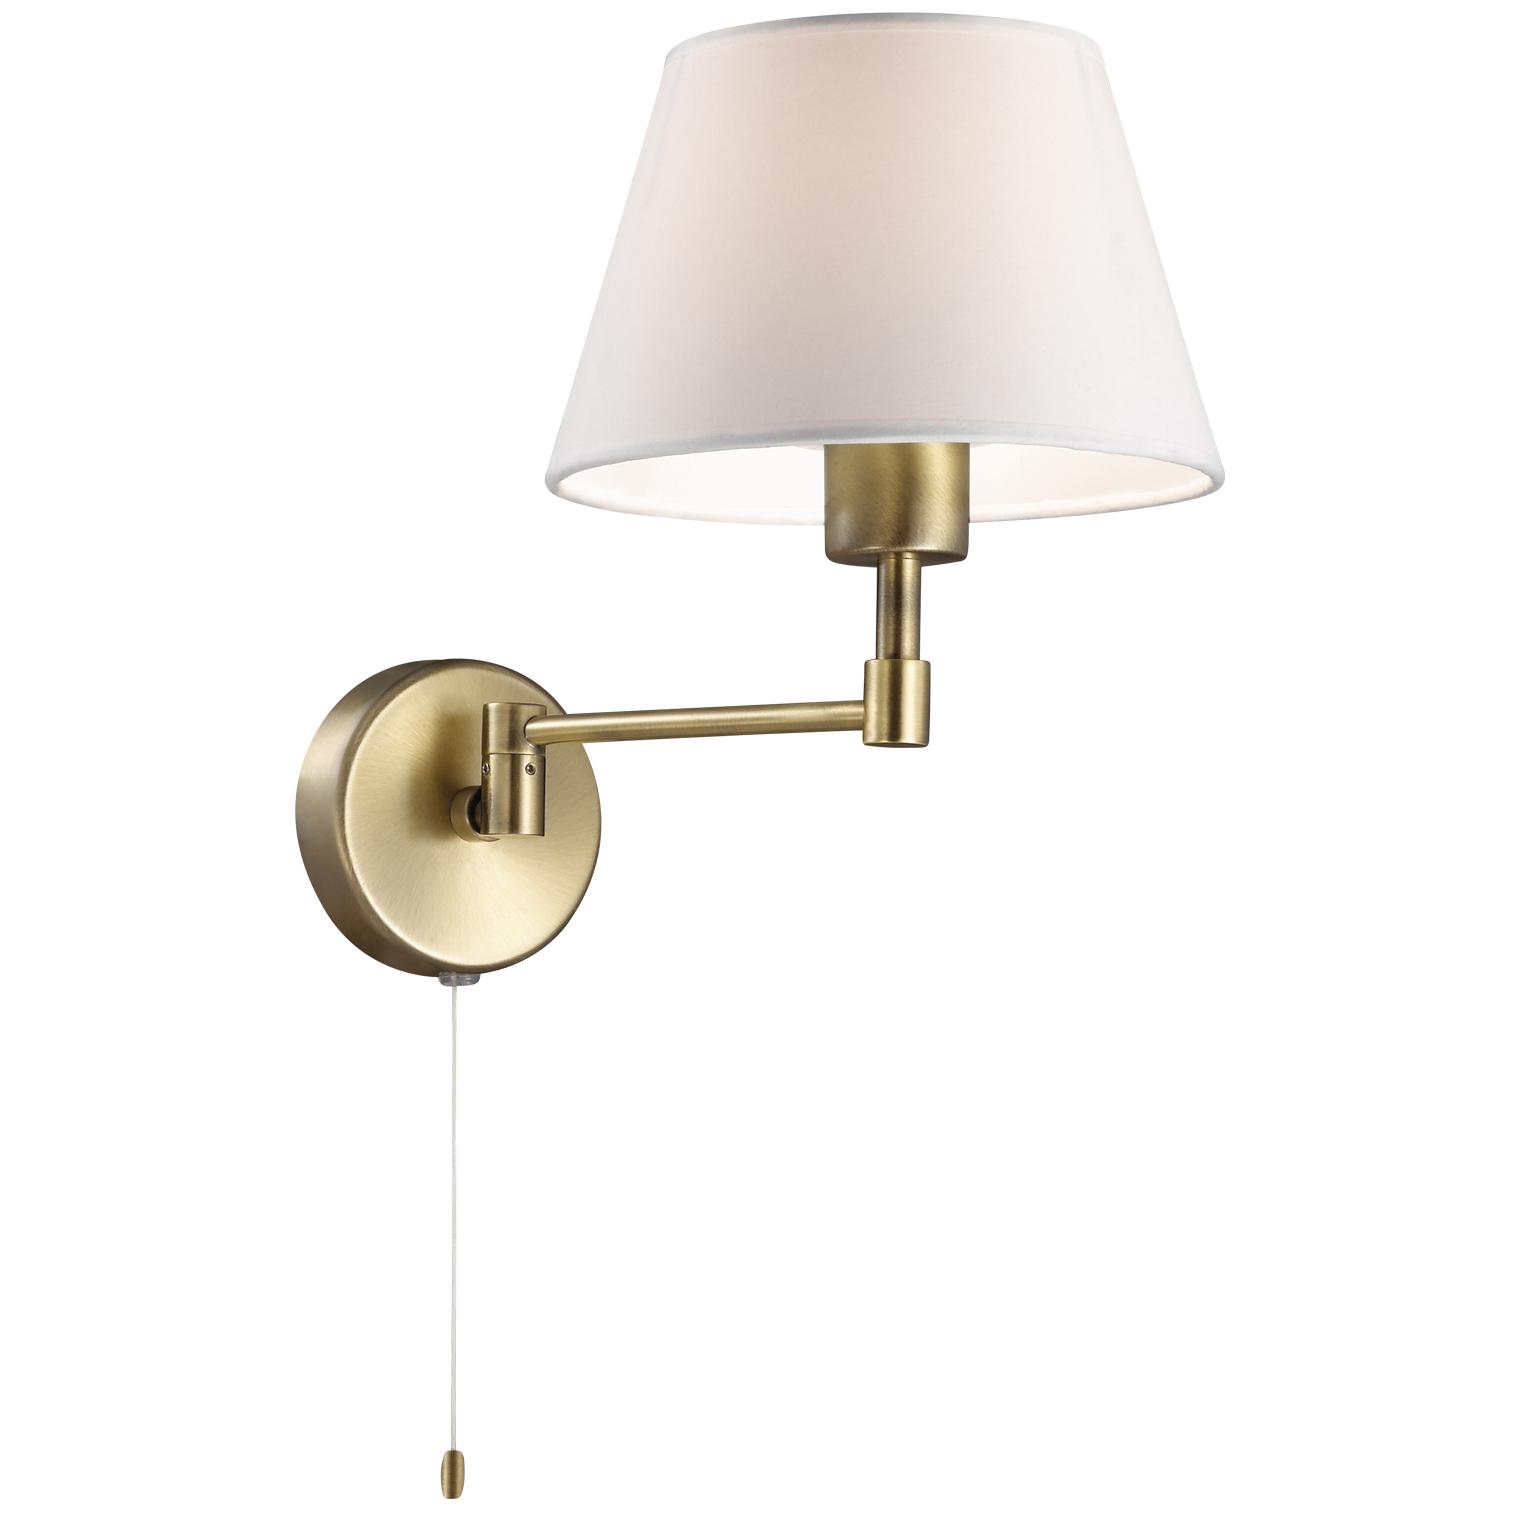 Бра Odeon light 2481/1w светильник настенный бра коллекция gemena 2481 1w бронза белый odeon light одеон лайт